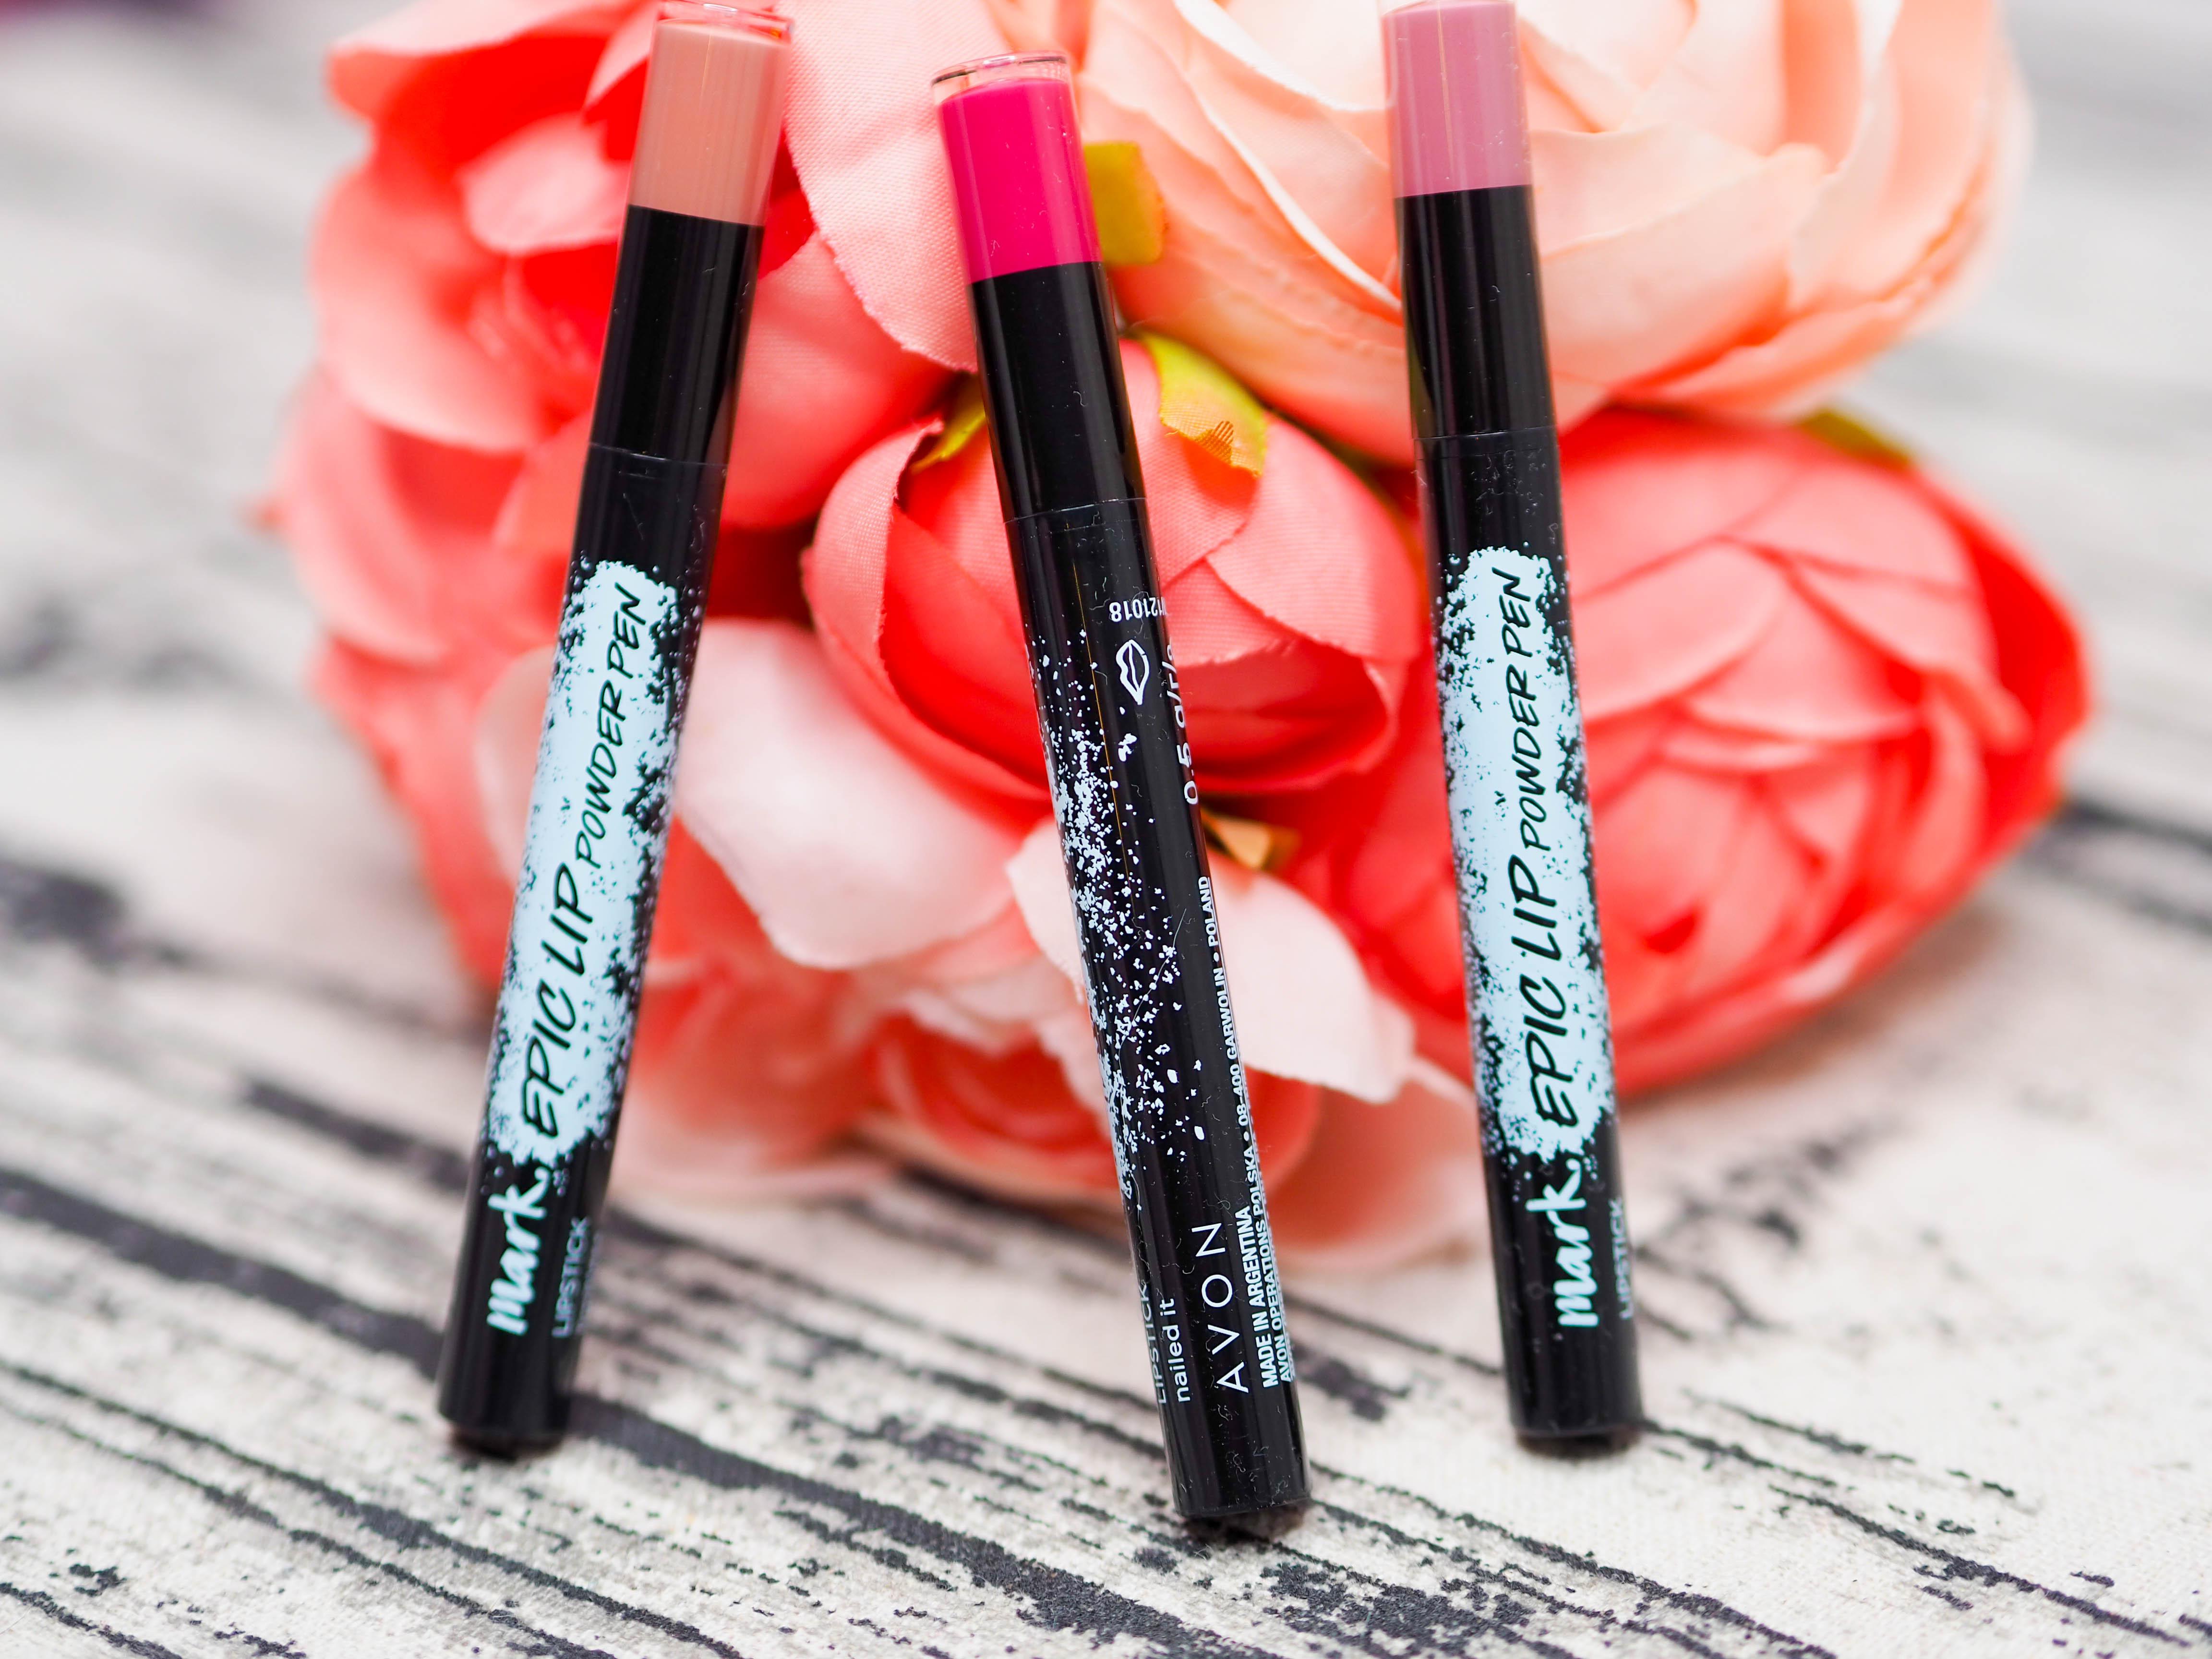 Avon Mark Epic Lip Powders